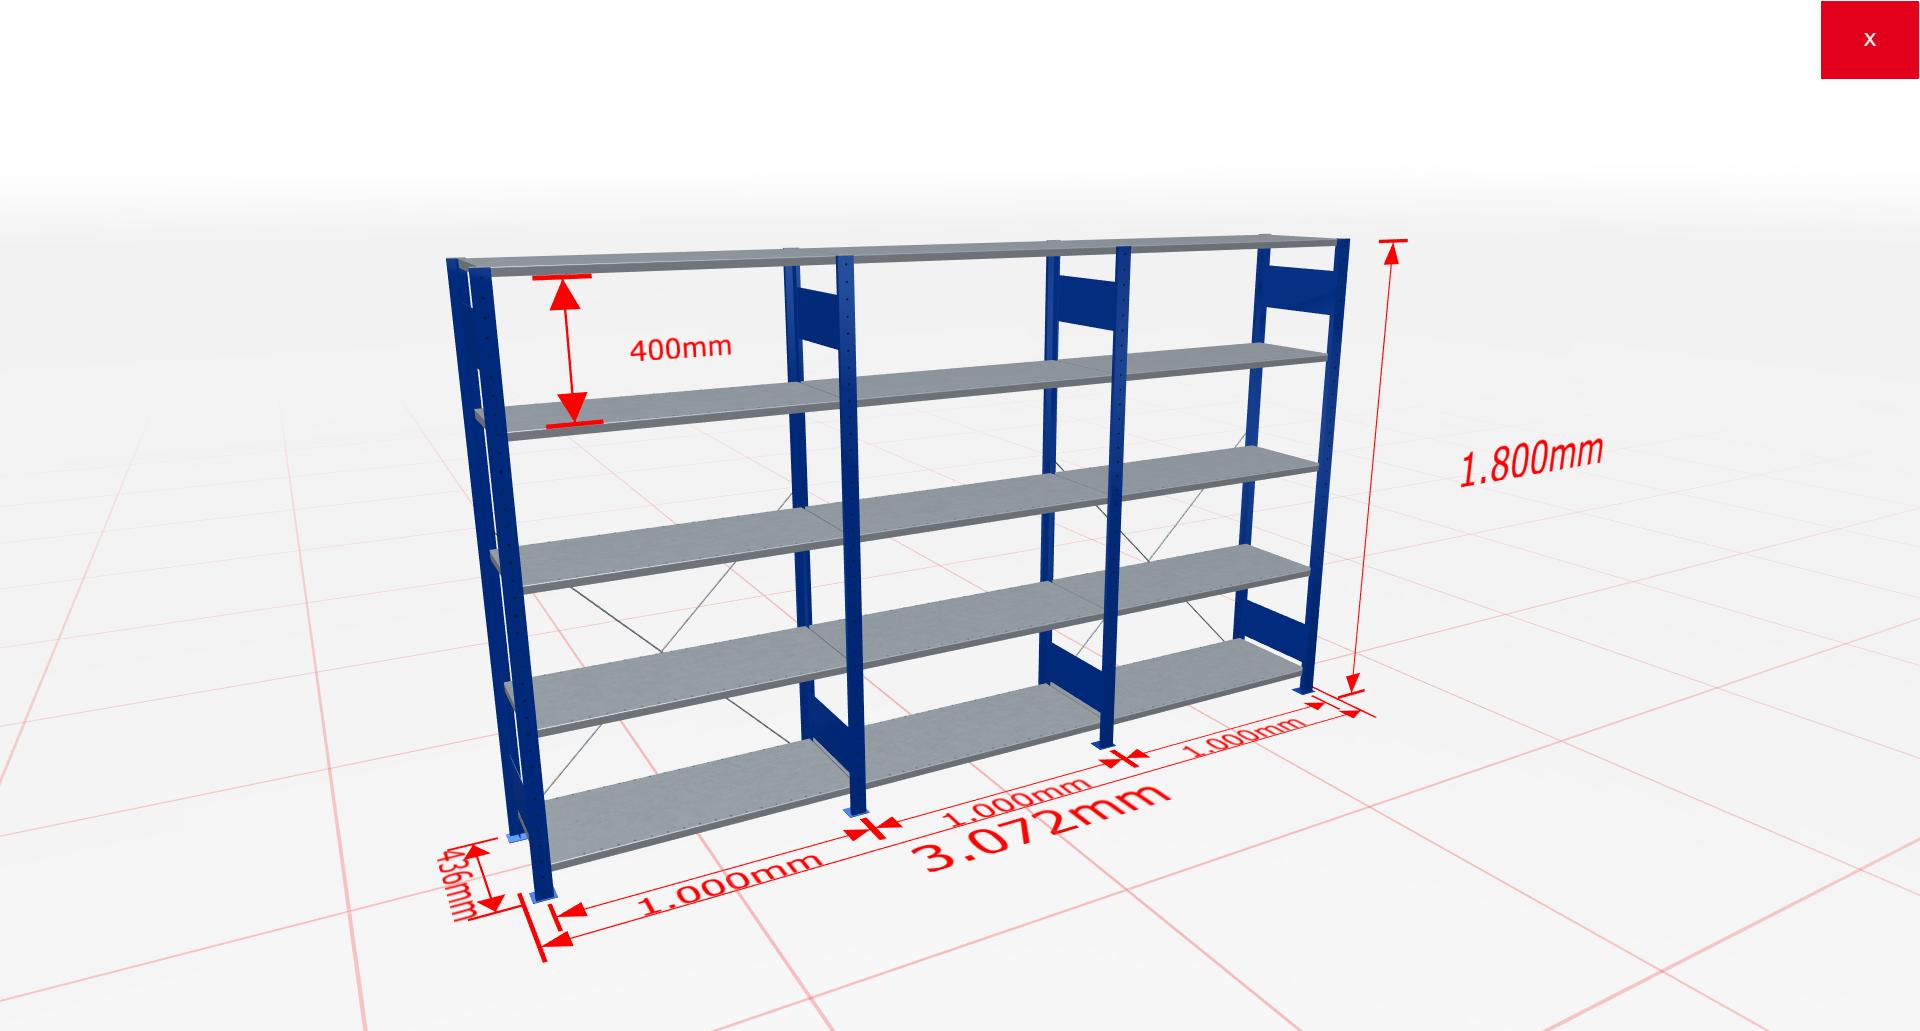 Fachbodenregal Komplettregal 1800x3072x400 mm (HxBxT) SCHULTE Lagertechnik blau 5 Ebenen  150 kg je Boden